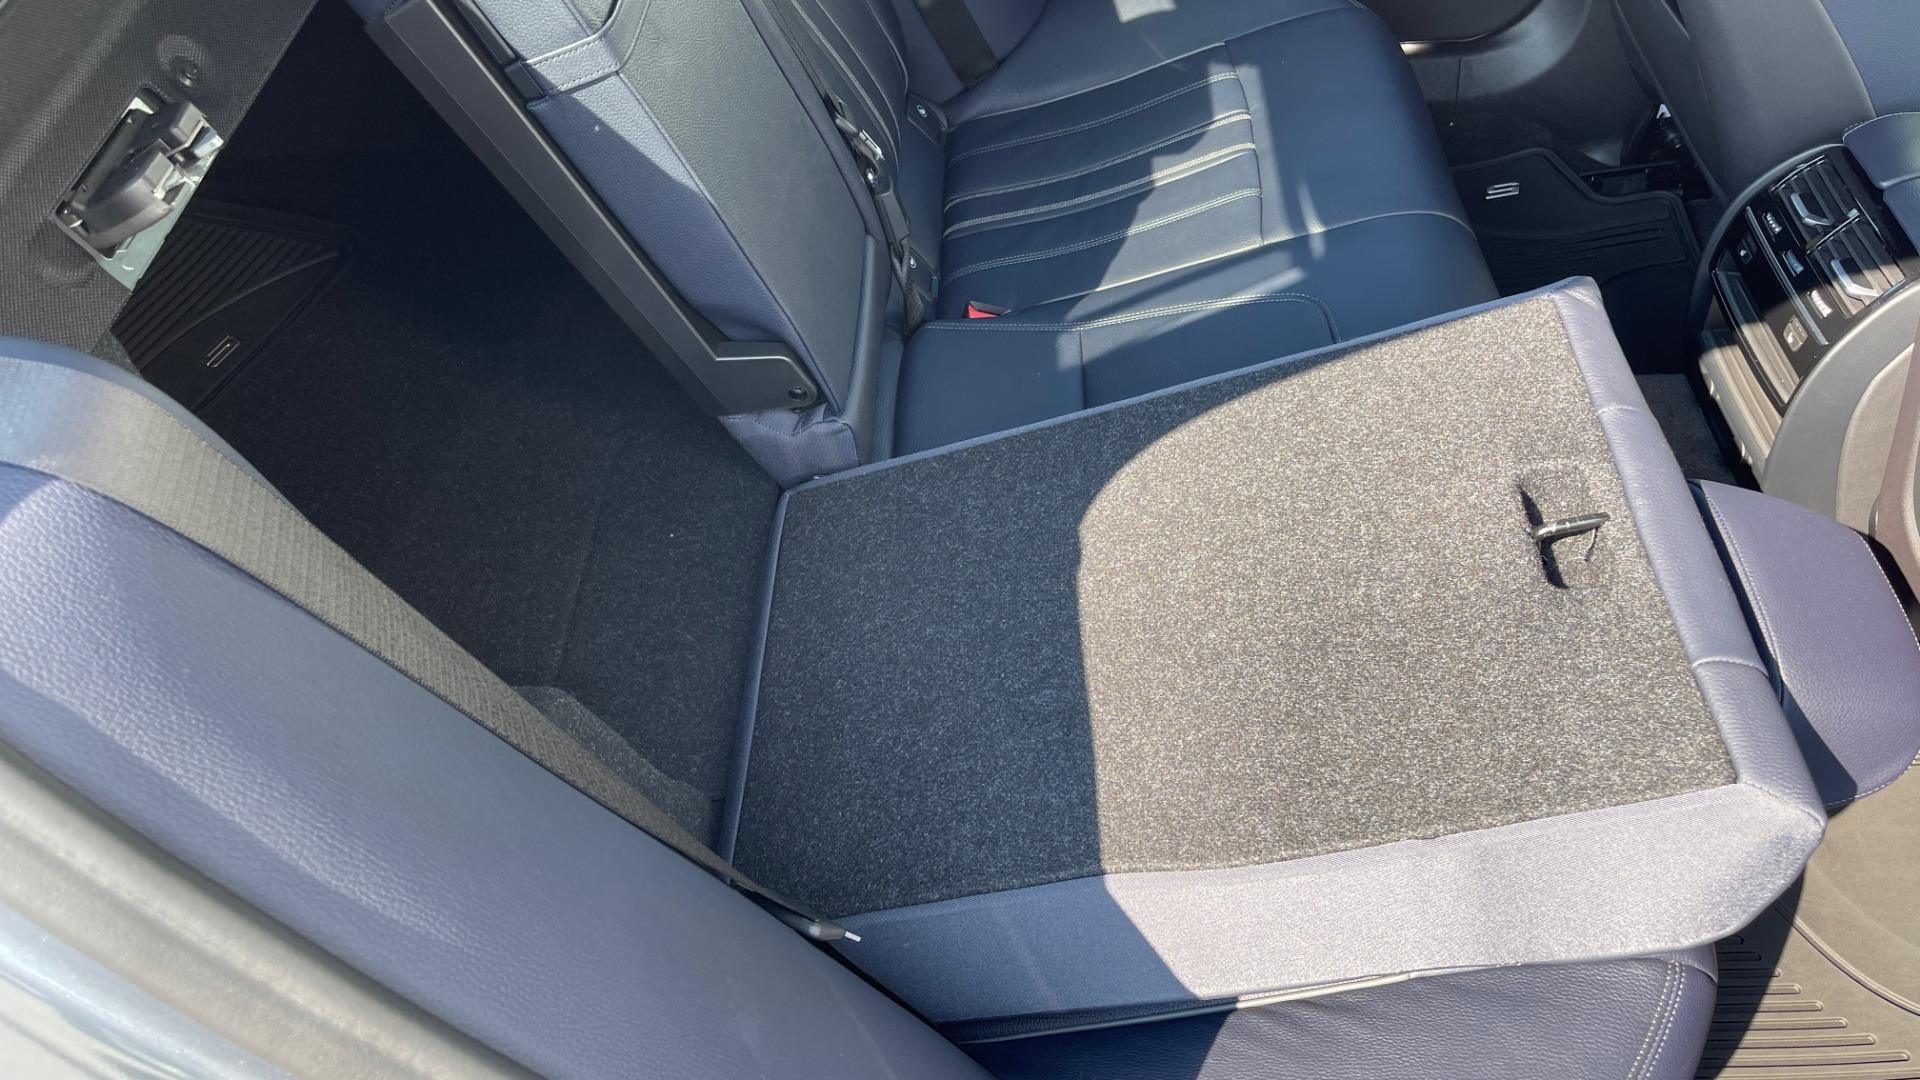 Used 2018 BMW 5 SERIES 540I XDRIVE M-SPORT / DRVR ASST / PDC / APPLE / HUD / H/K SND for sale $42,795 at Formula Imports in Charlotte NC 28227 21